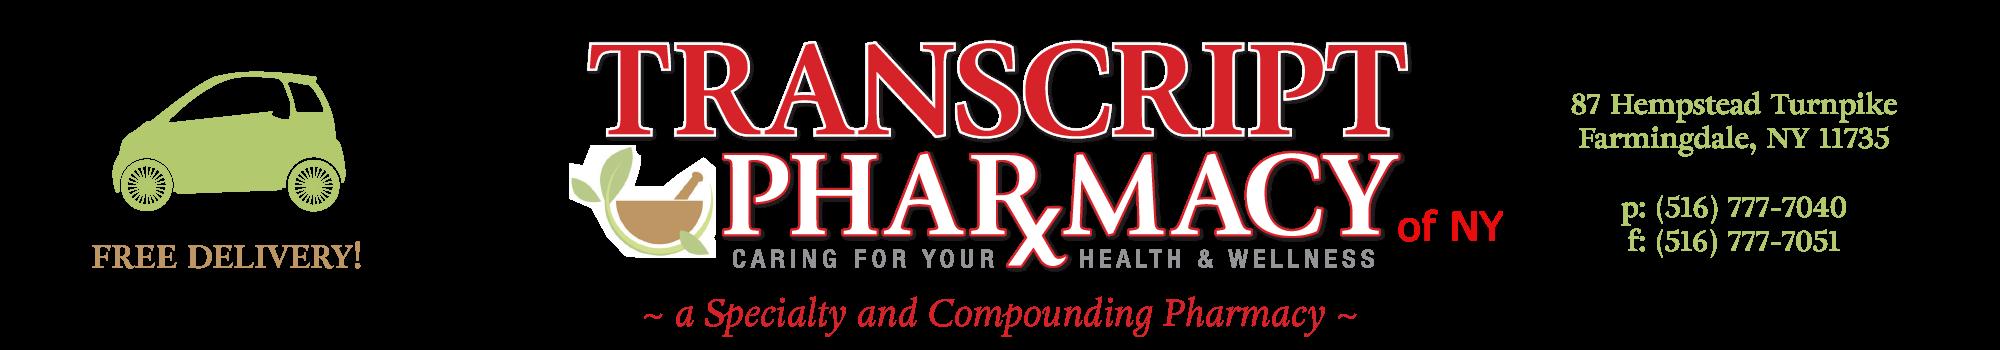 Transcript Pharmacy